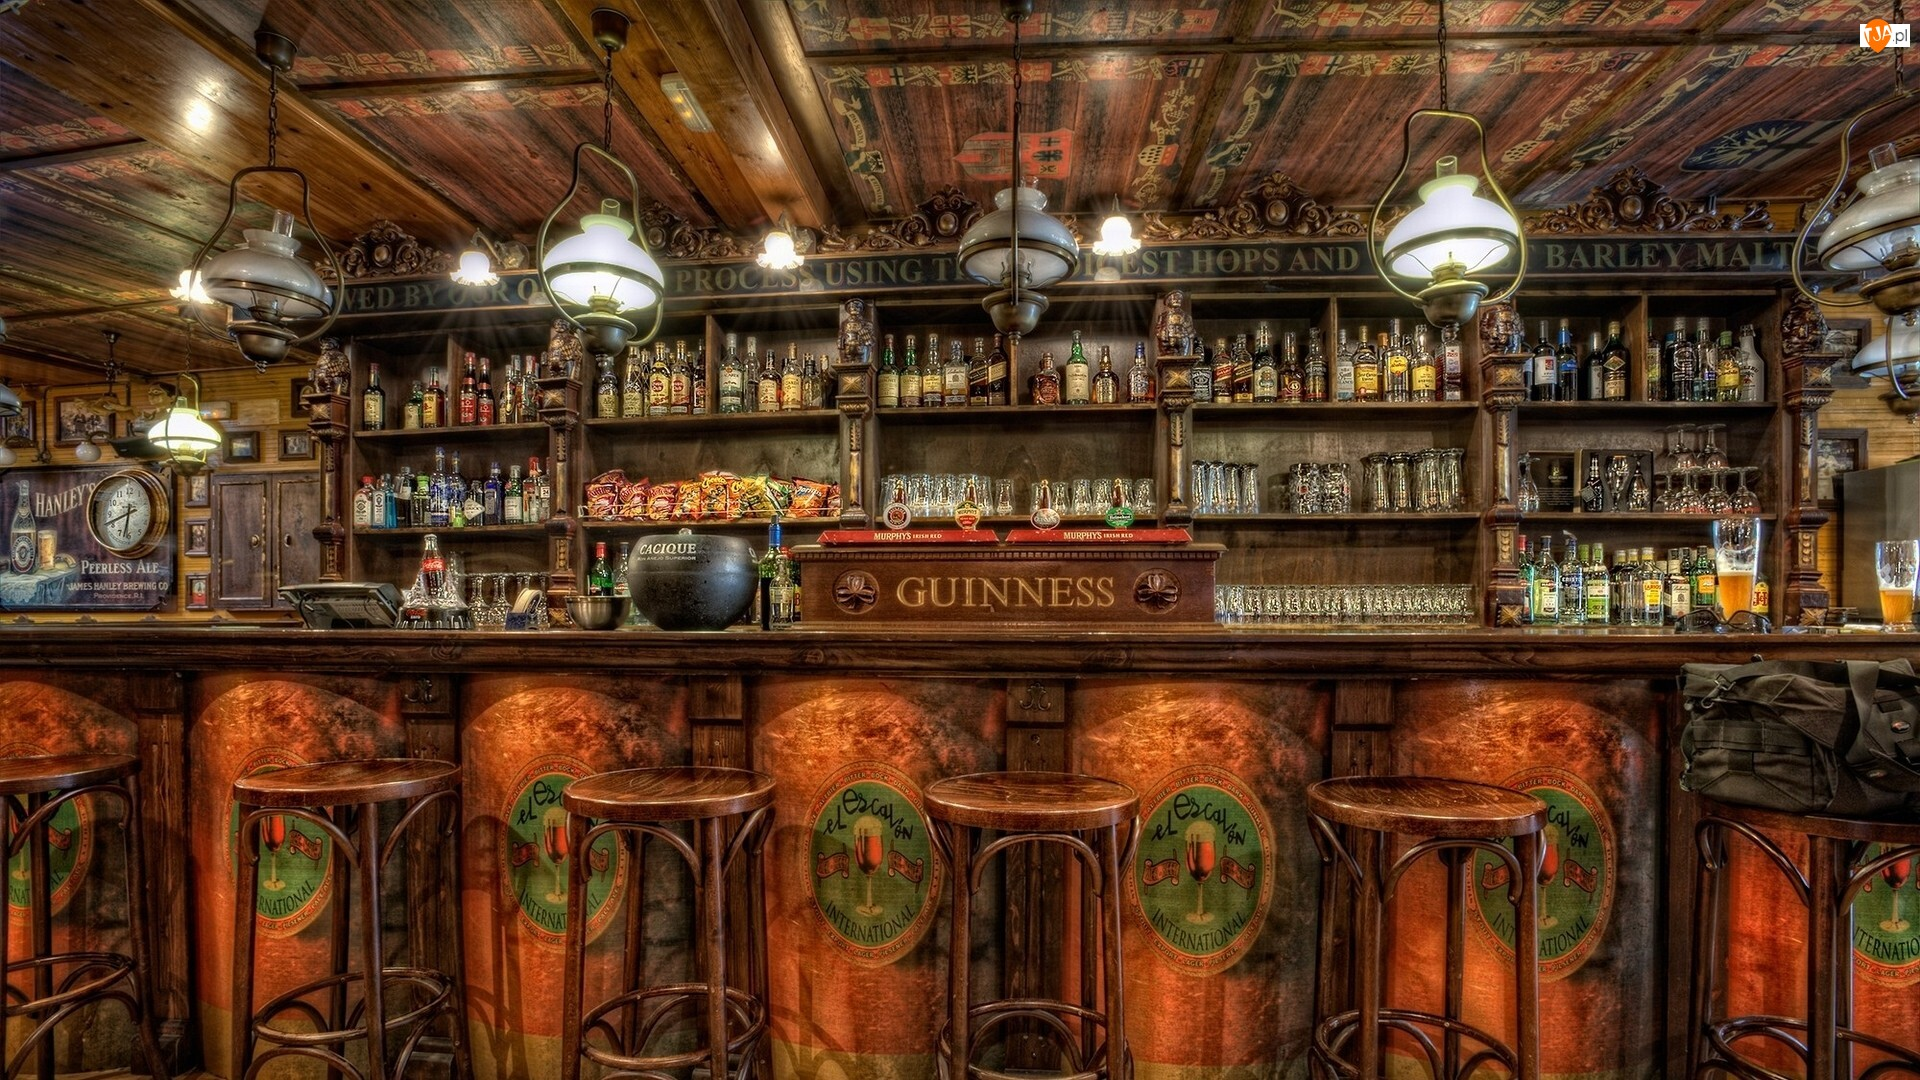 Bar, HDR, Wnętrze, Lokal, Alkohole